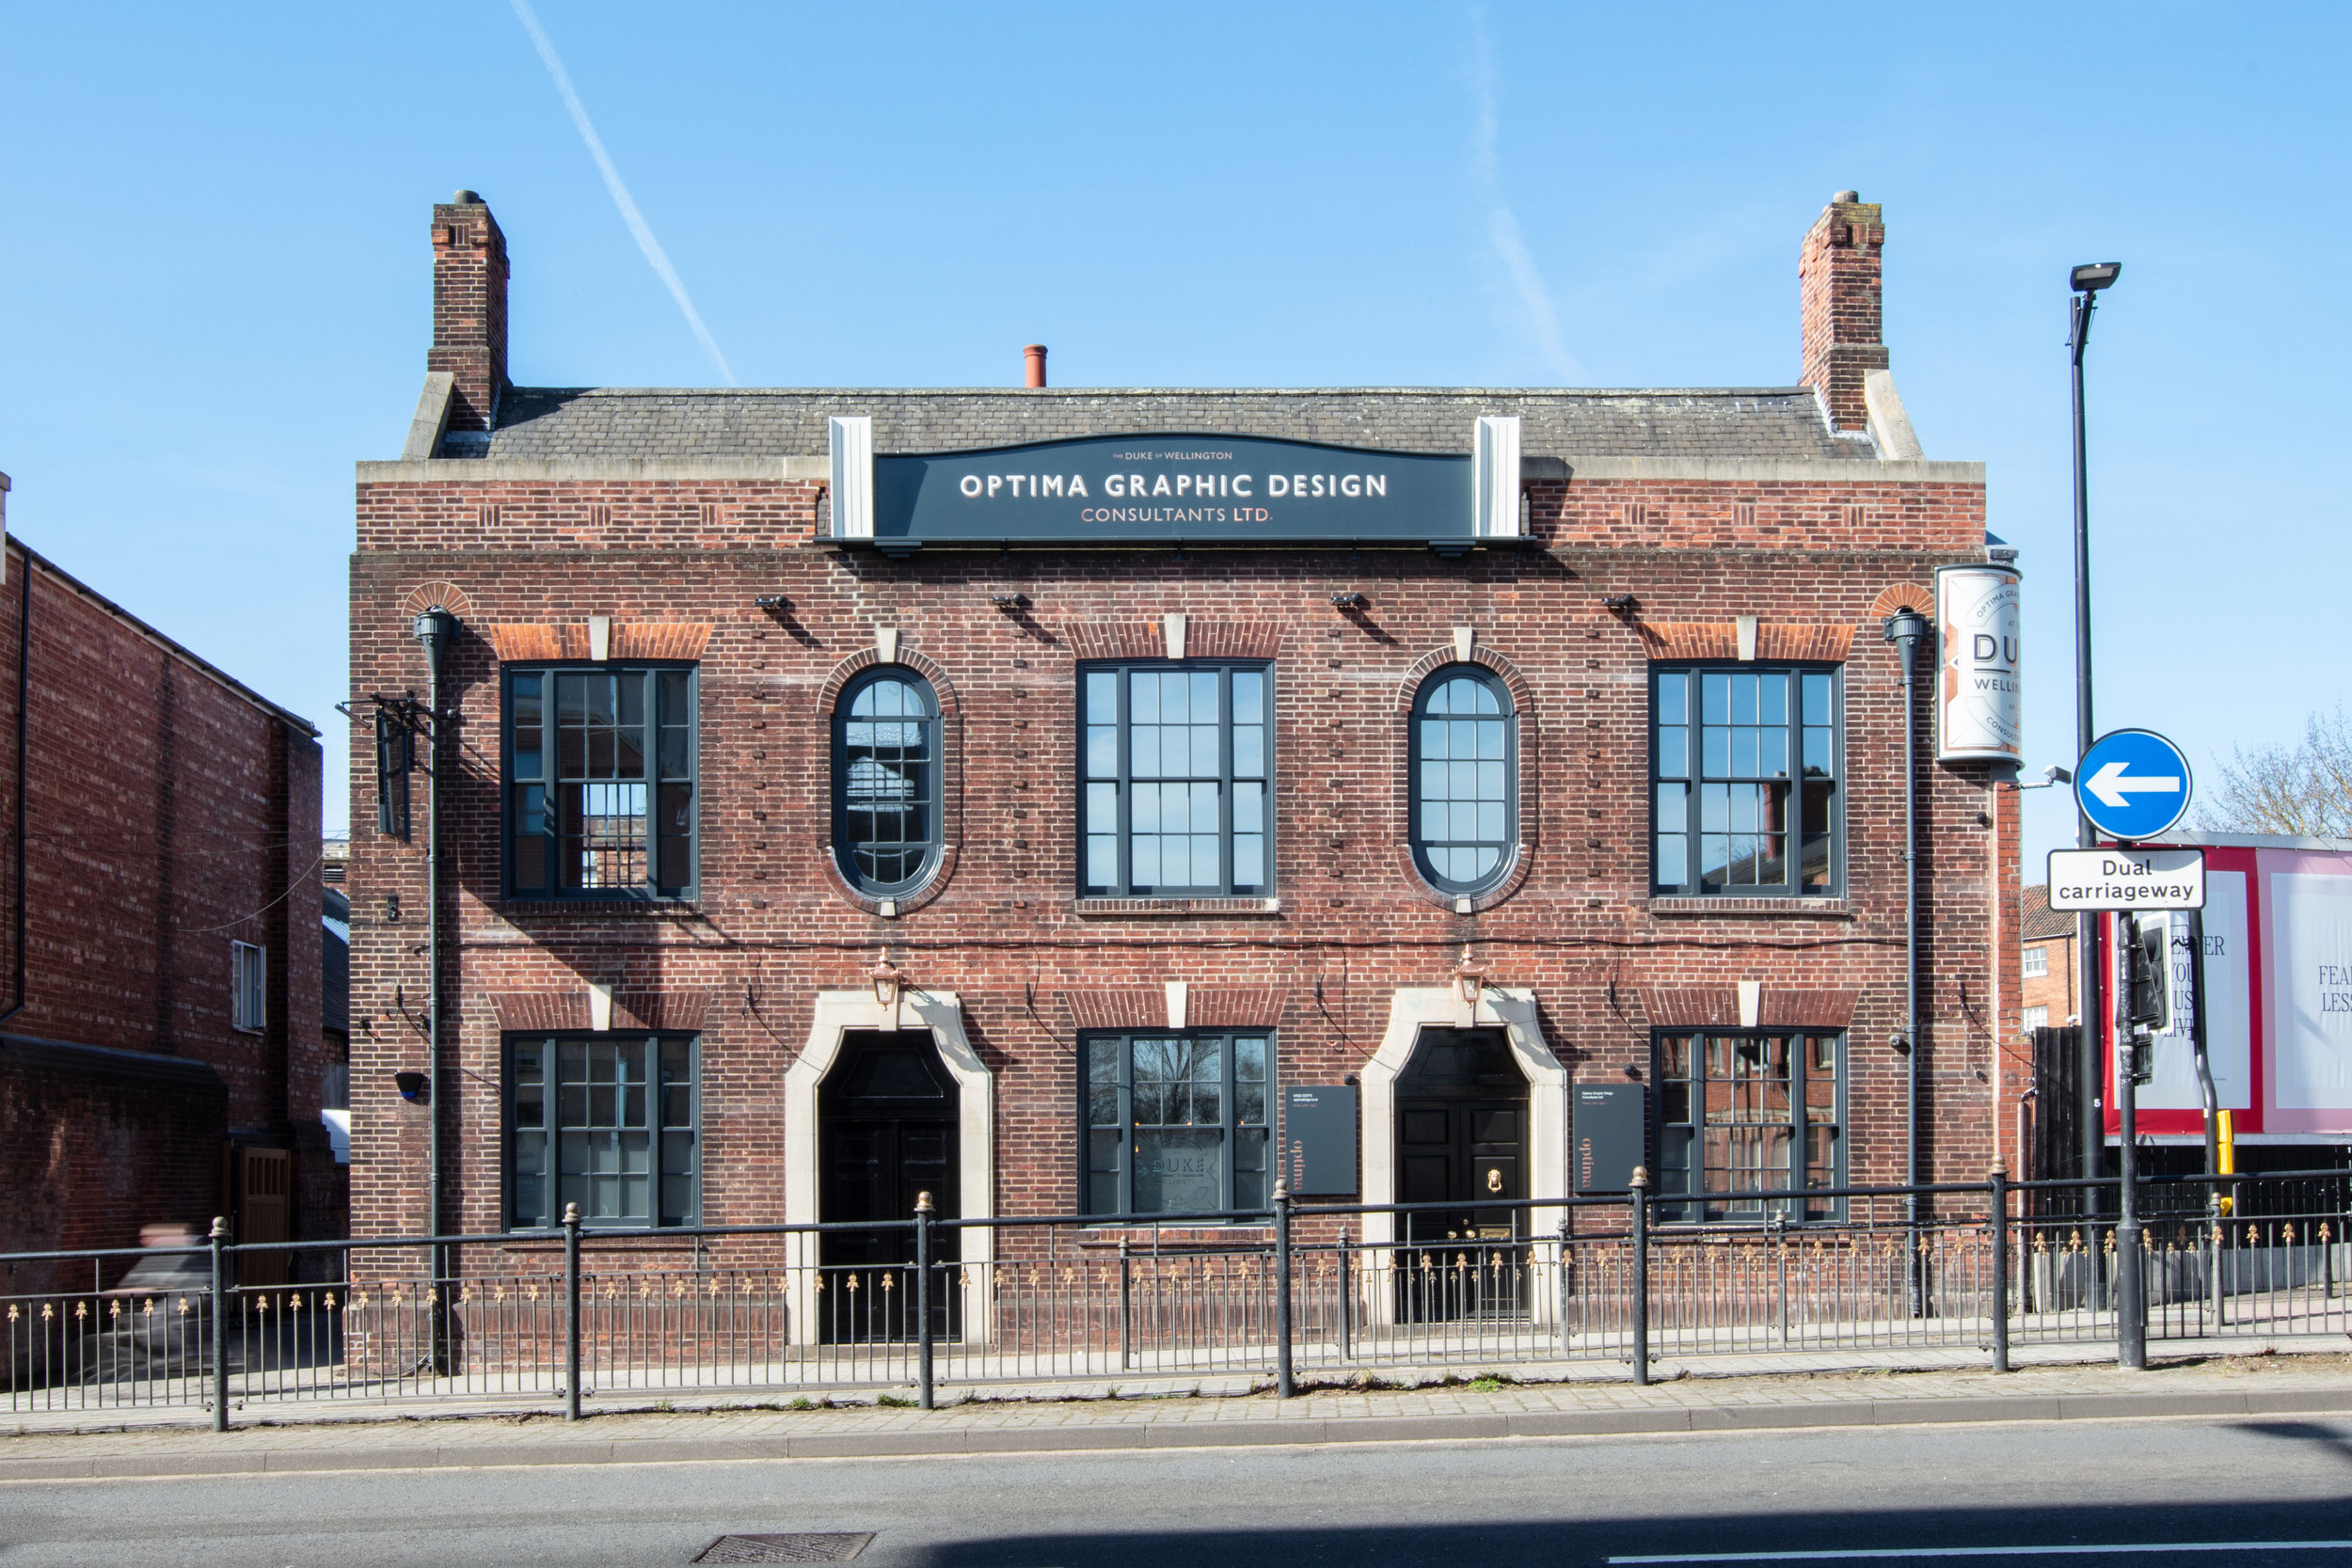 duke of wellington, broadgate, lincoln  Refurbishment - derelict public house into modern commercial office space